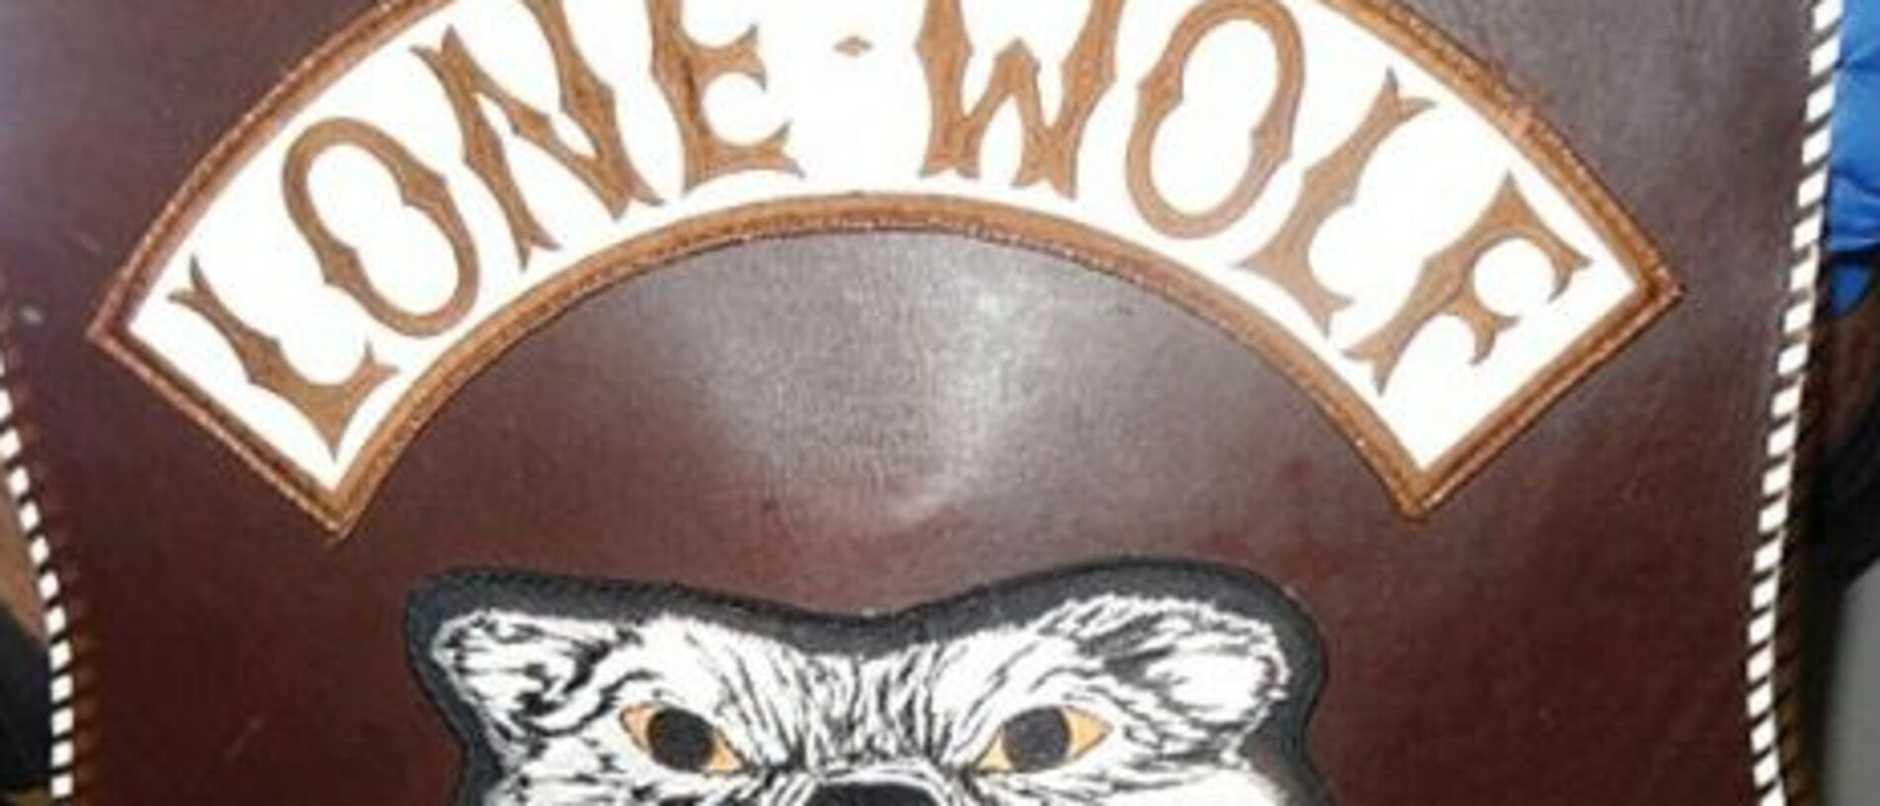 Lone Wolf bikie colours vest.